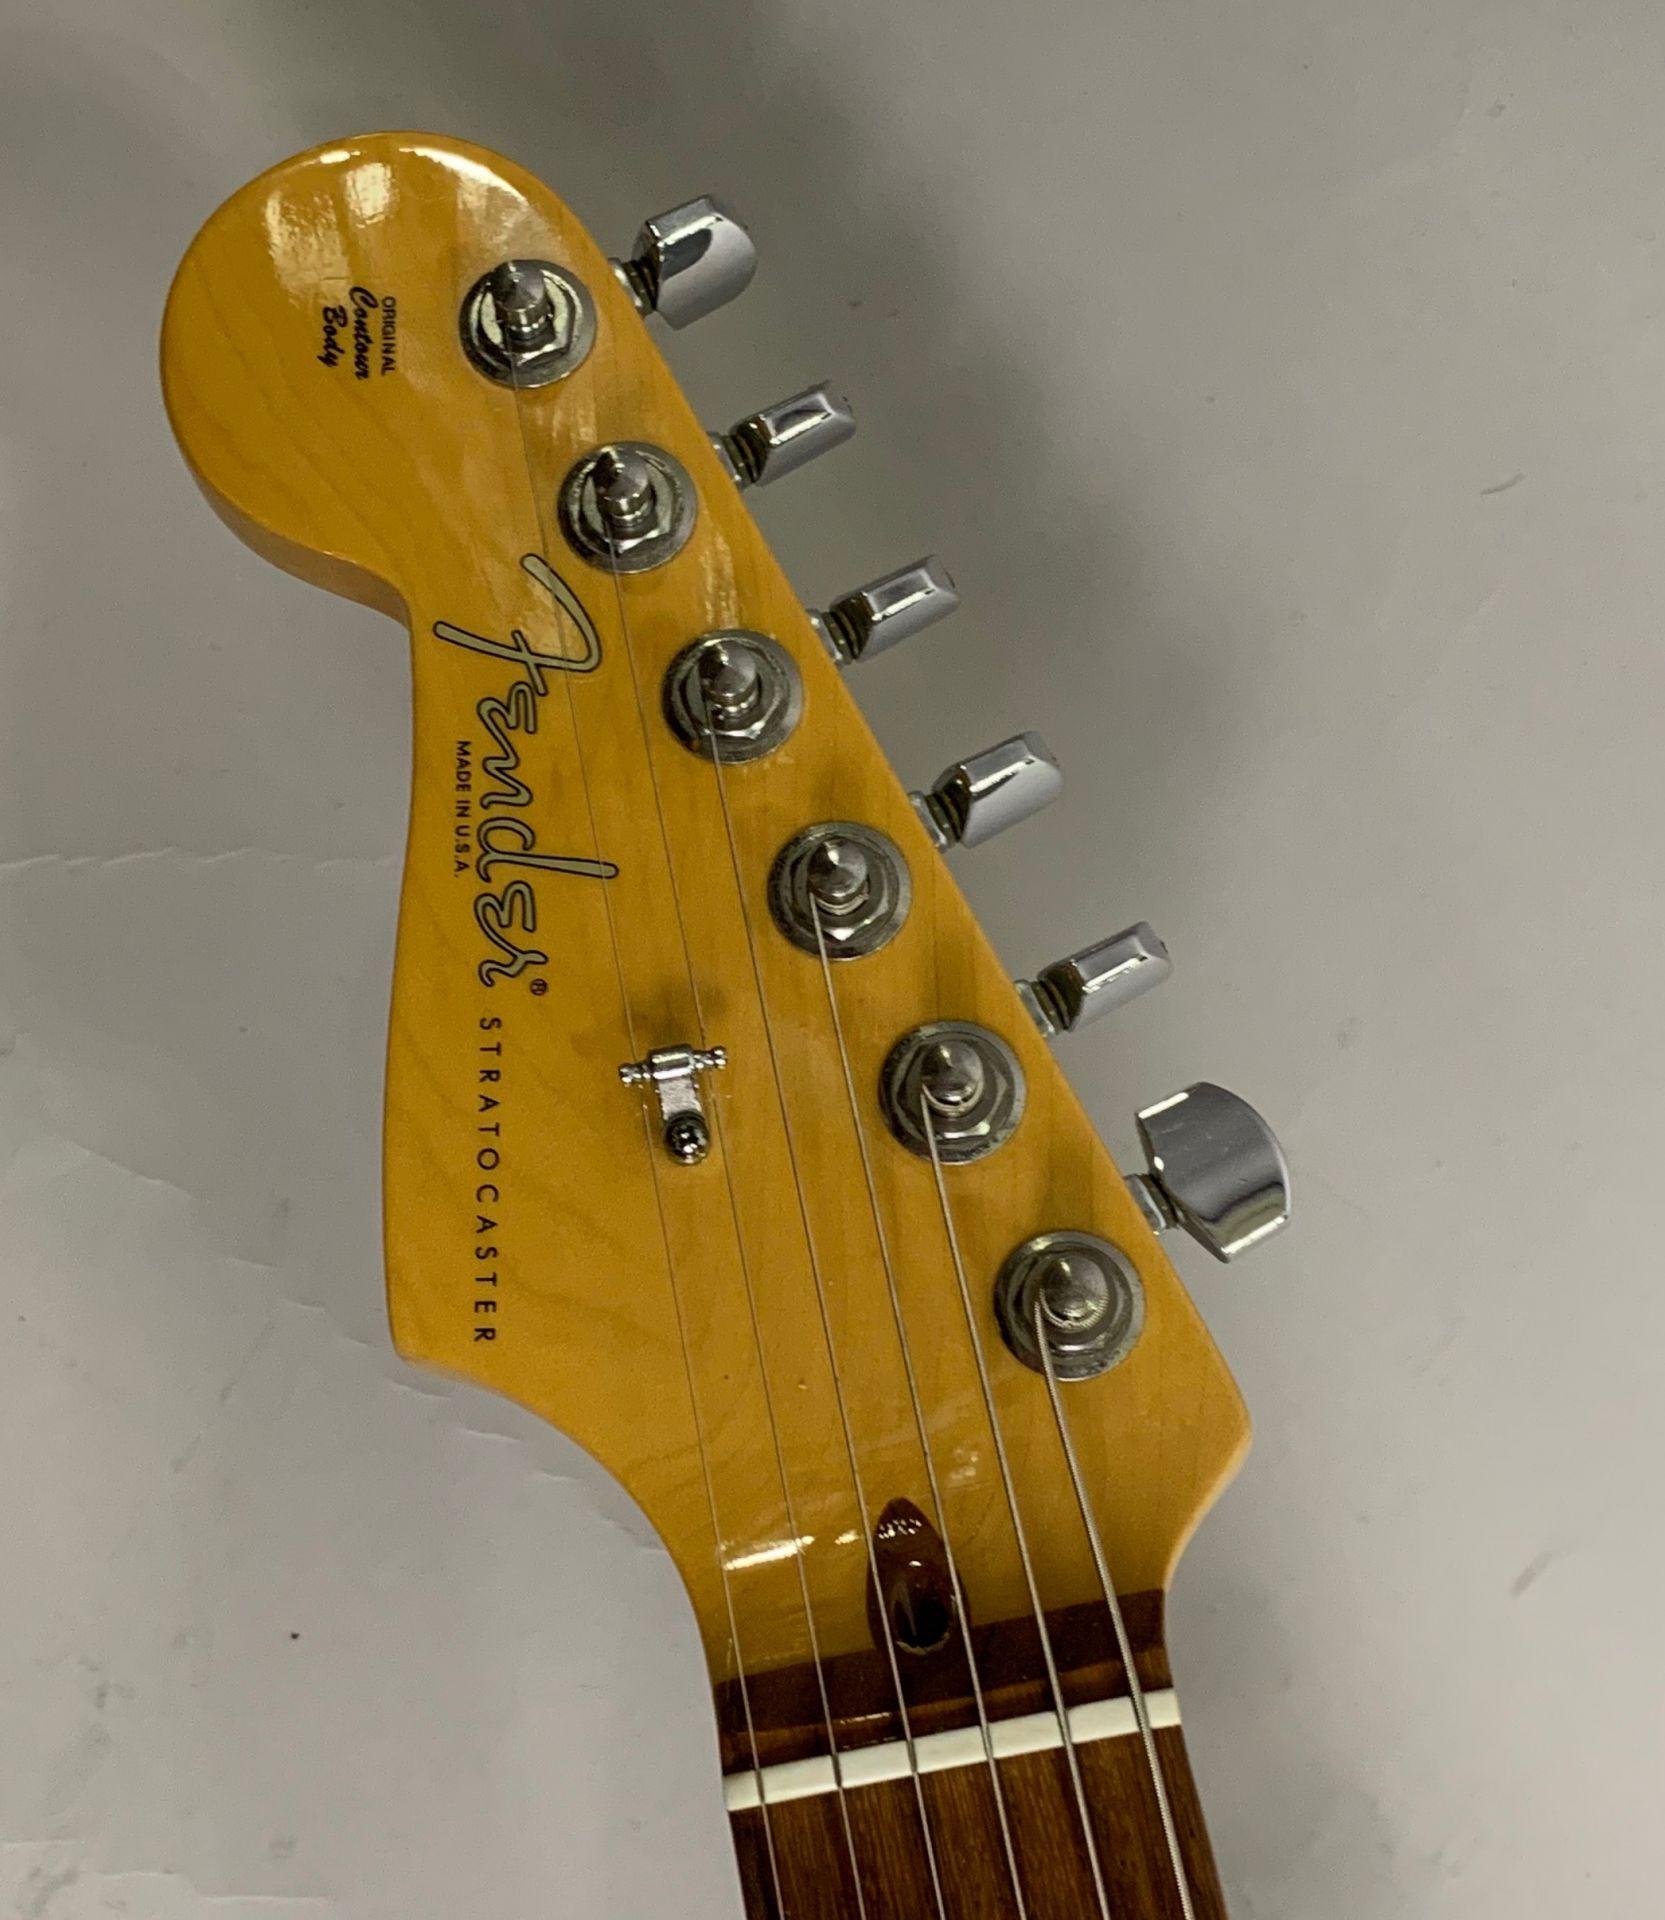 American Standard Stratcaster Lefthand 左利き レフティストラト アメスタのヘッド画像